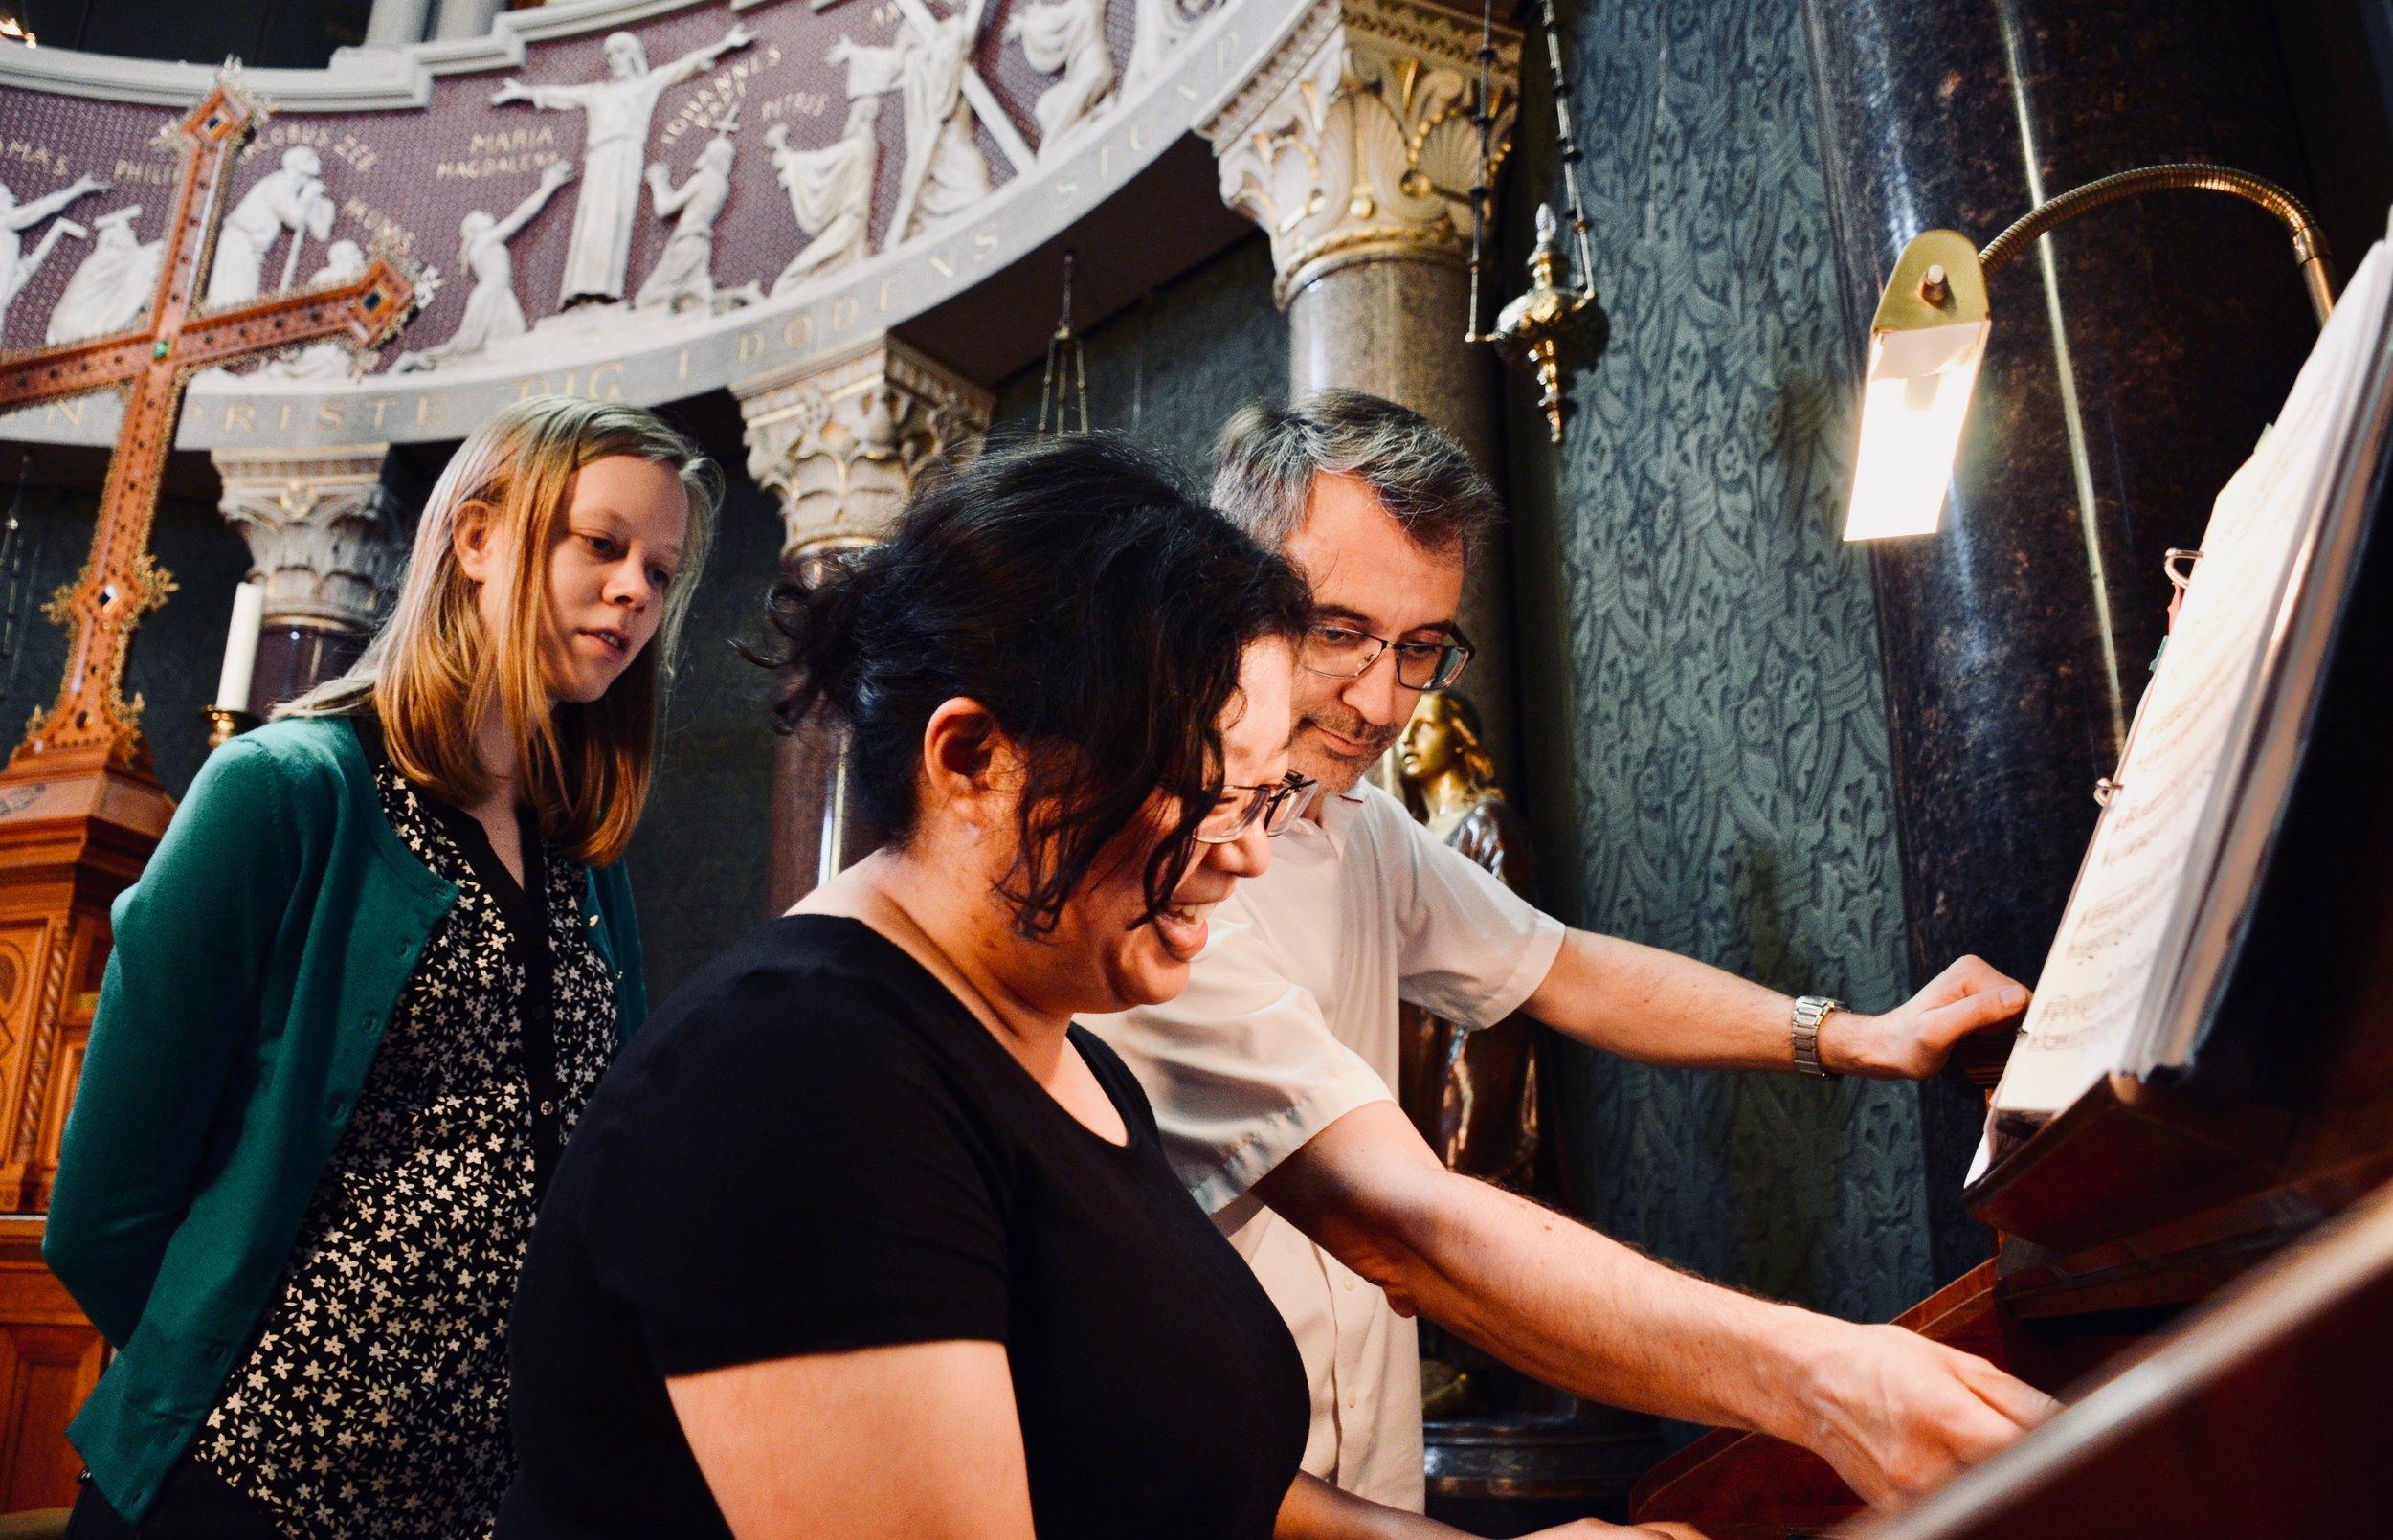 Sven Verner Olsen assists Jennifer Hsiao at the harmonium, Jesuskirke, Copenhagen.